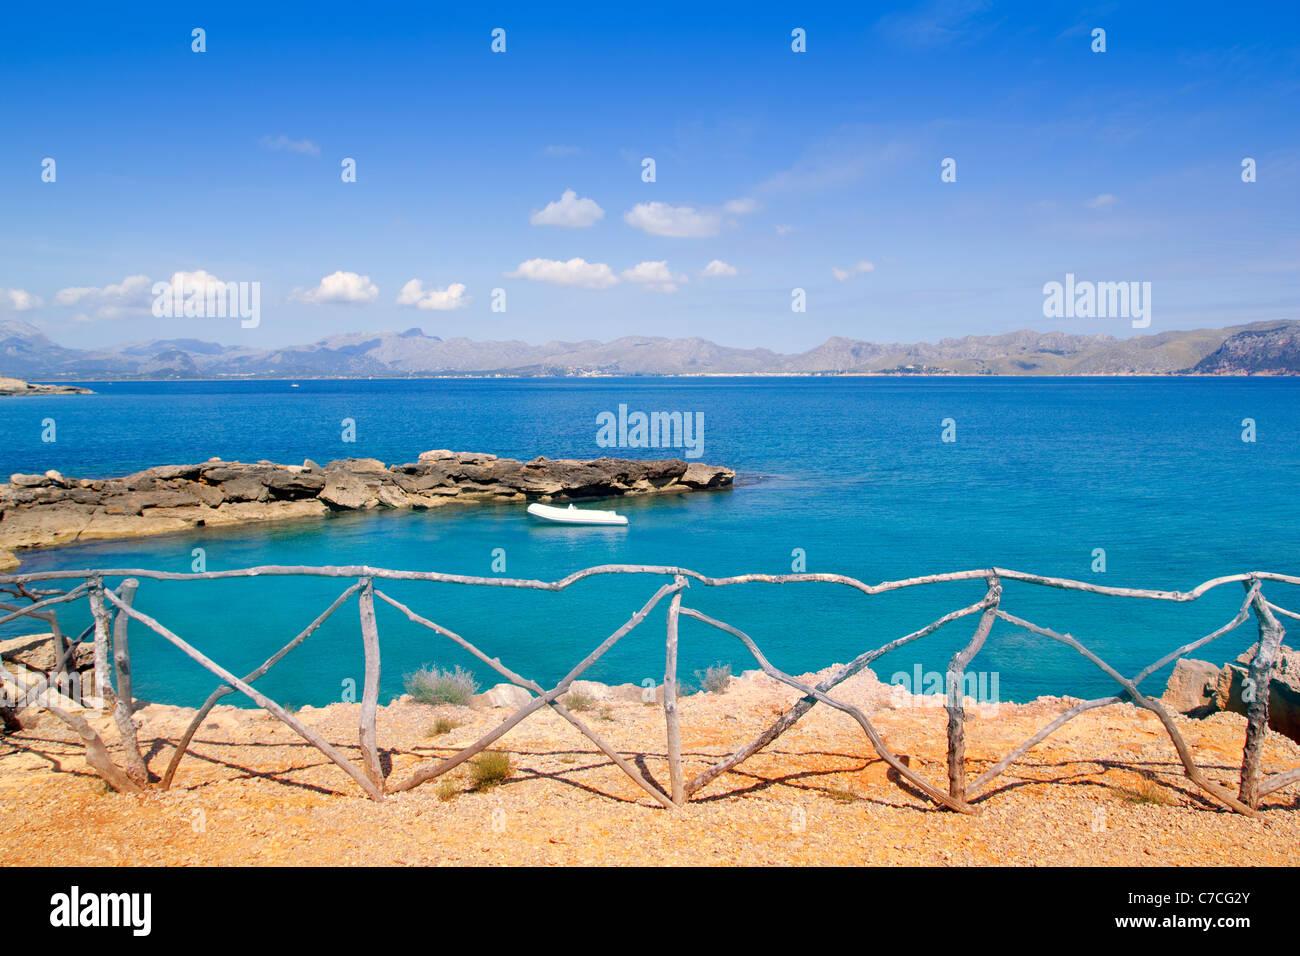 Alcudia en Mallorca la victoria turquesa playa cerca de s Illot desde Islas Baleares Imagen De Stock